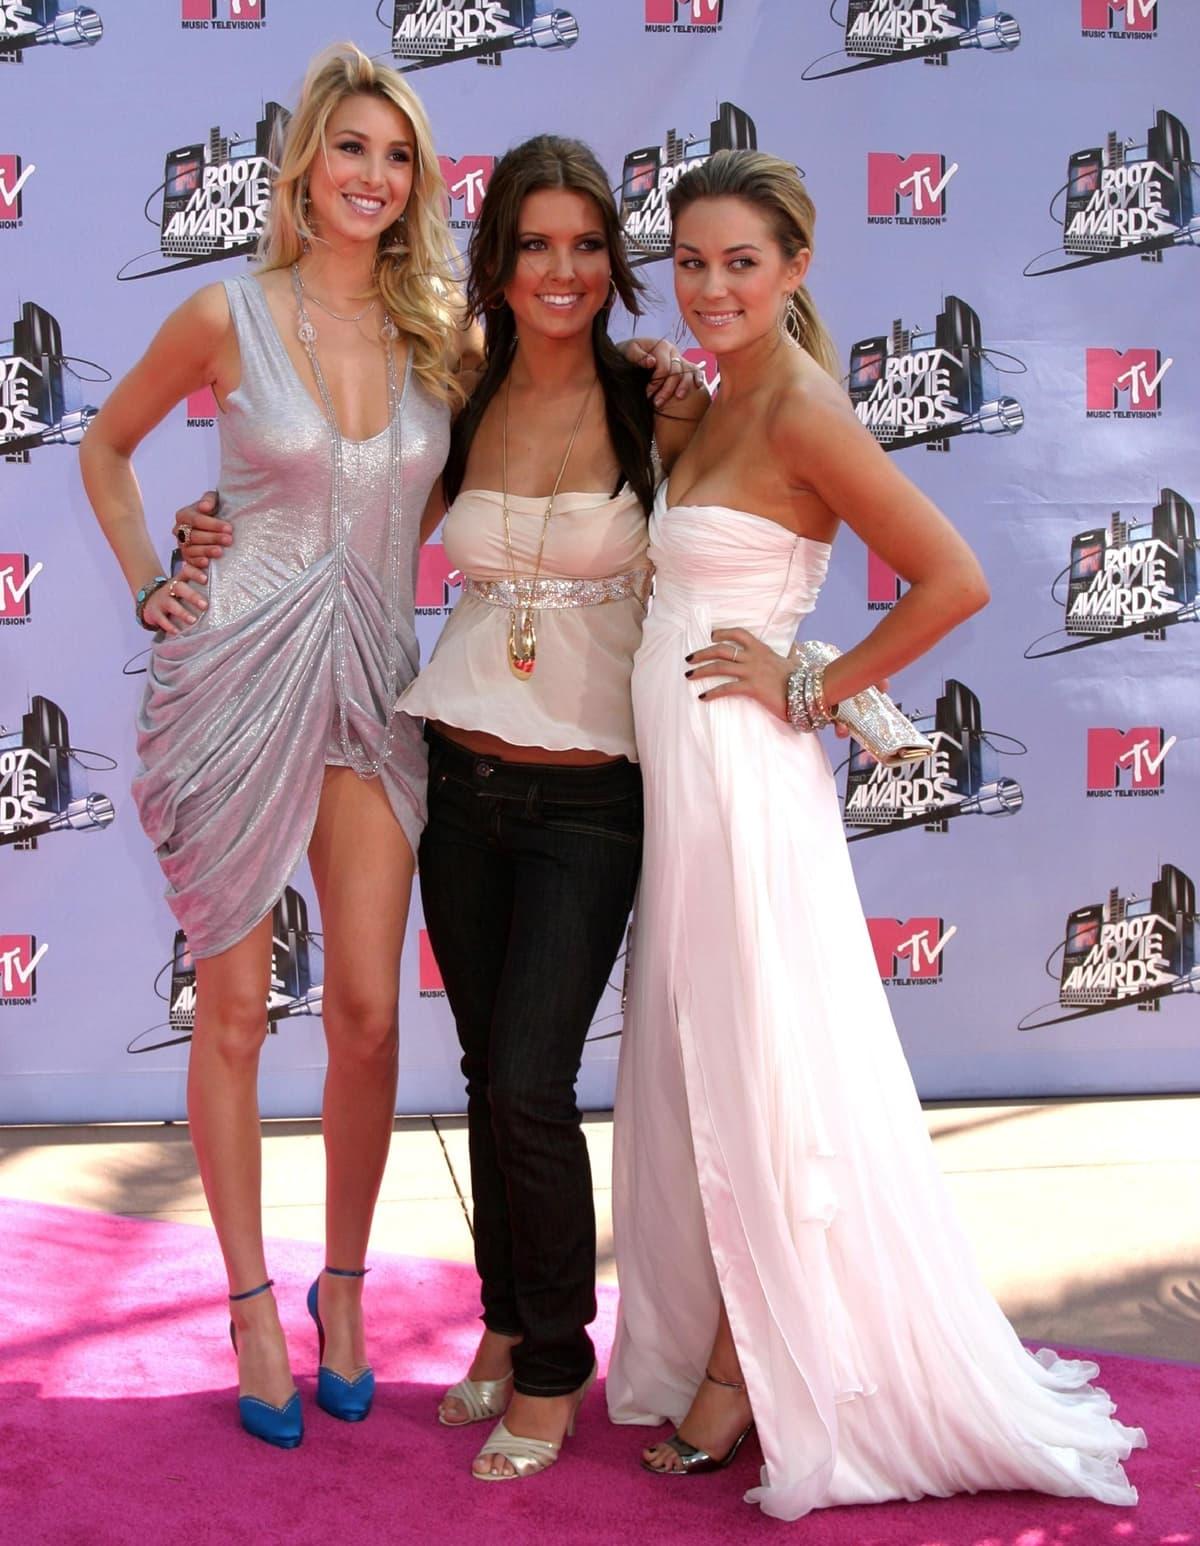 Whitney Port, Audrina Patridge, and Lauren Conrad attend the 2007 MTV Movie Awards